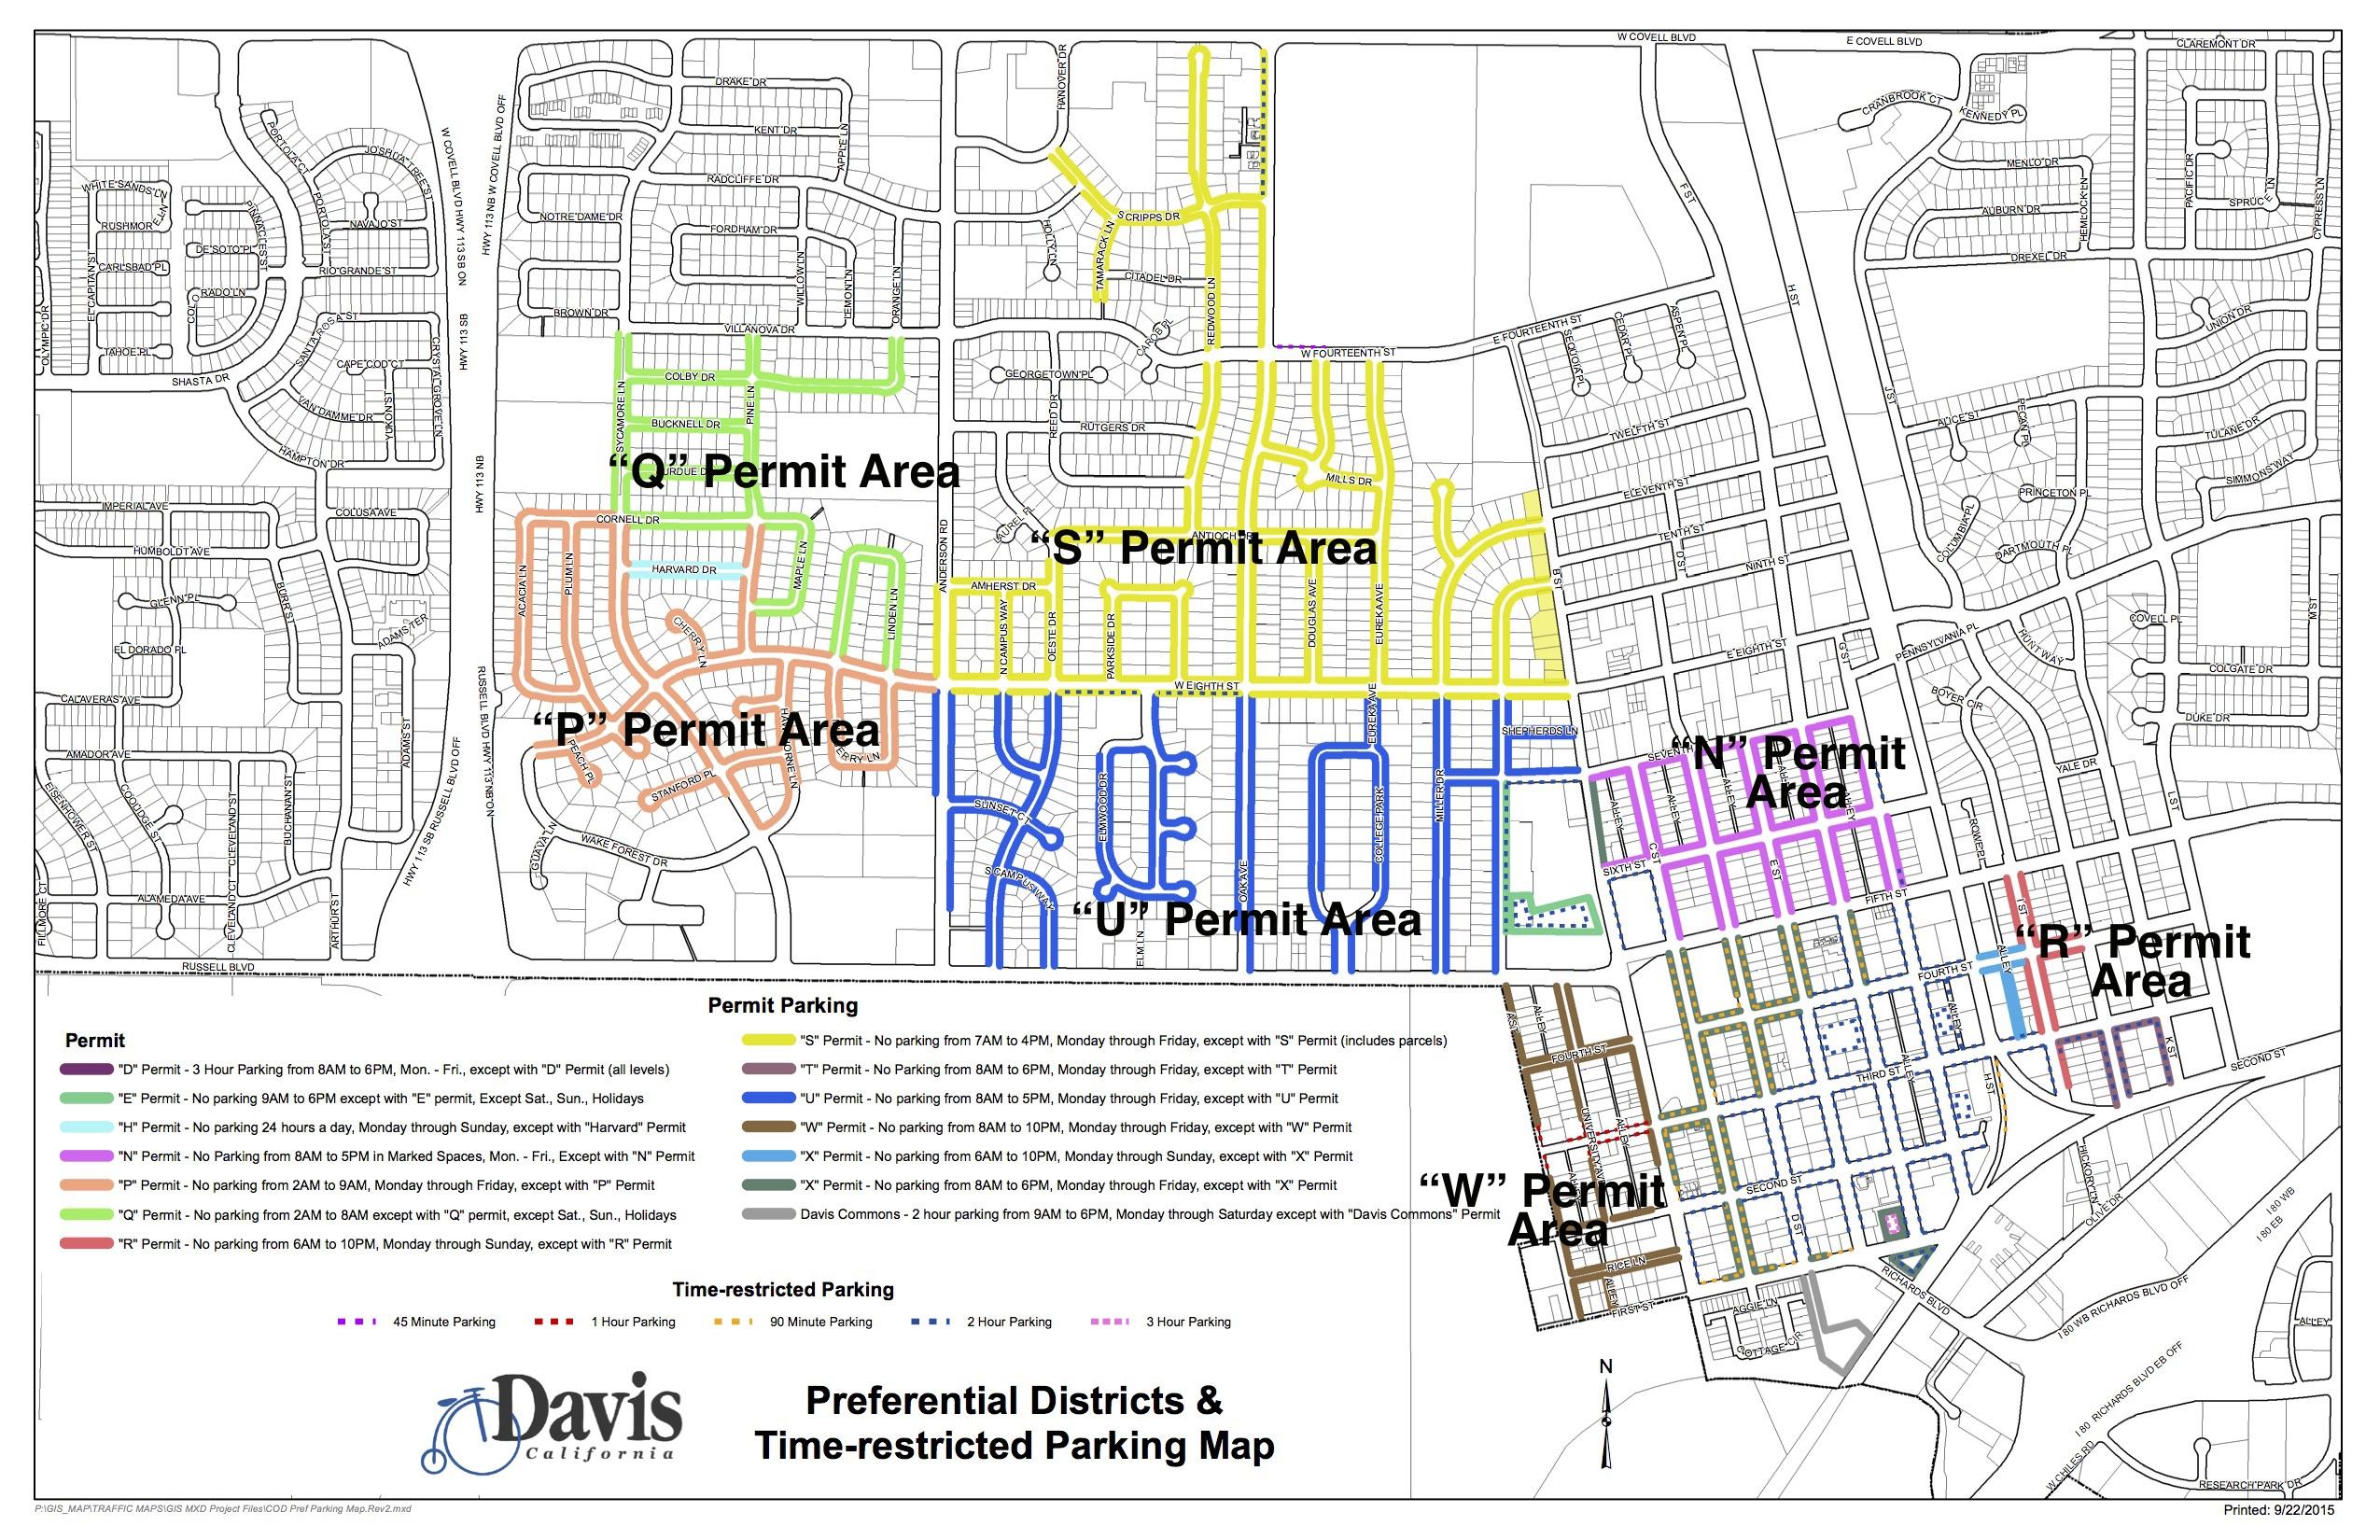 https://www.davisvanguard.org/wp-content/uploads/2017/06/All-Zones-Permit-Parking-Map10-with-labels.jpg